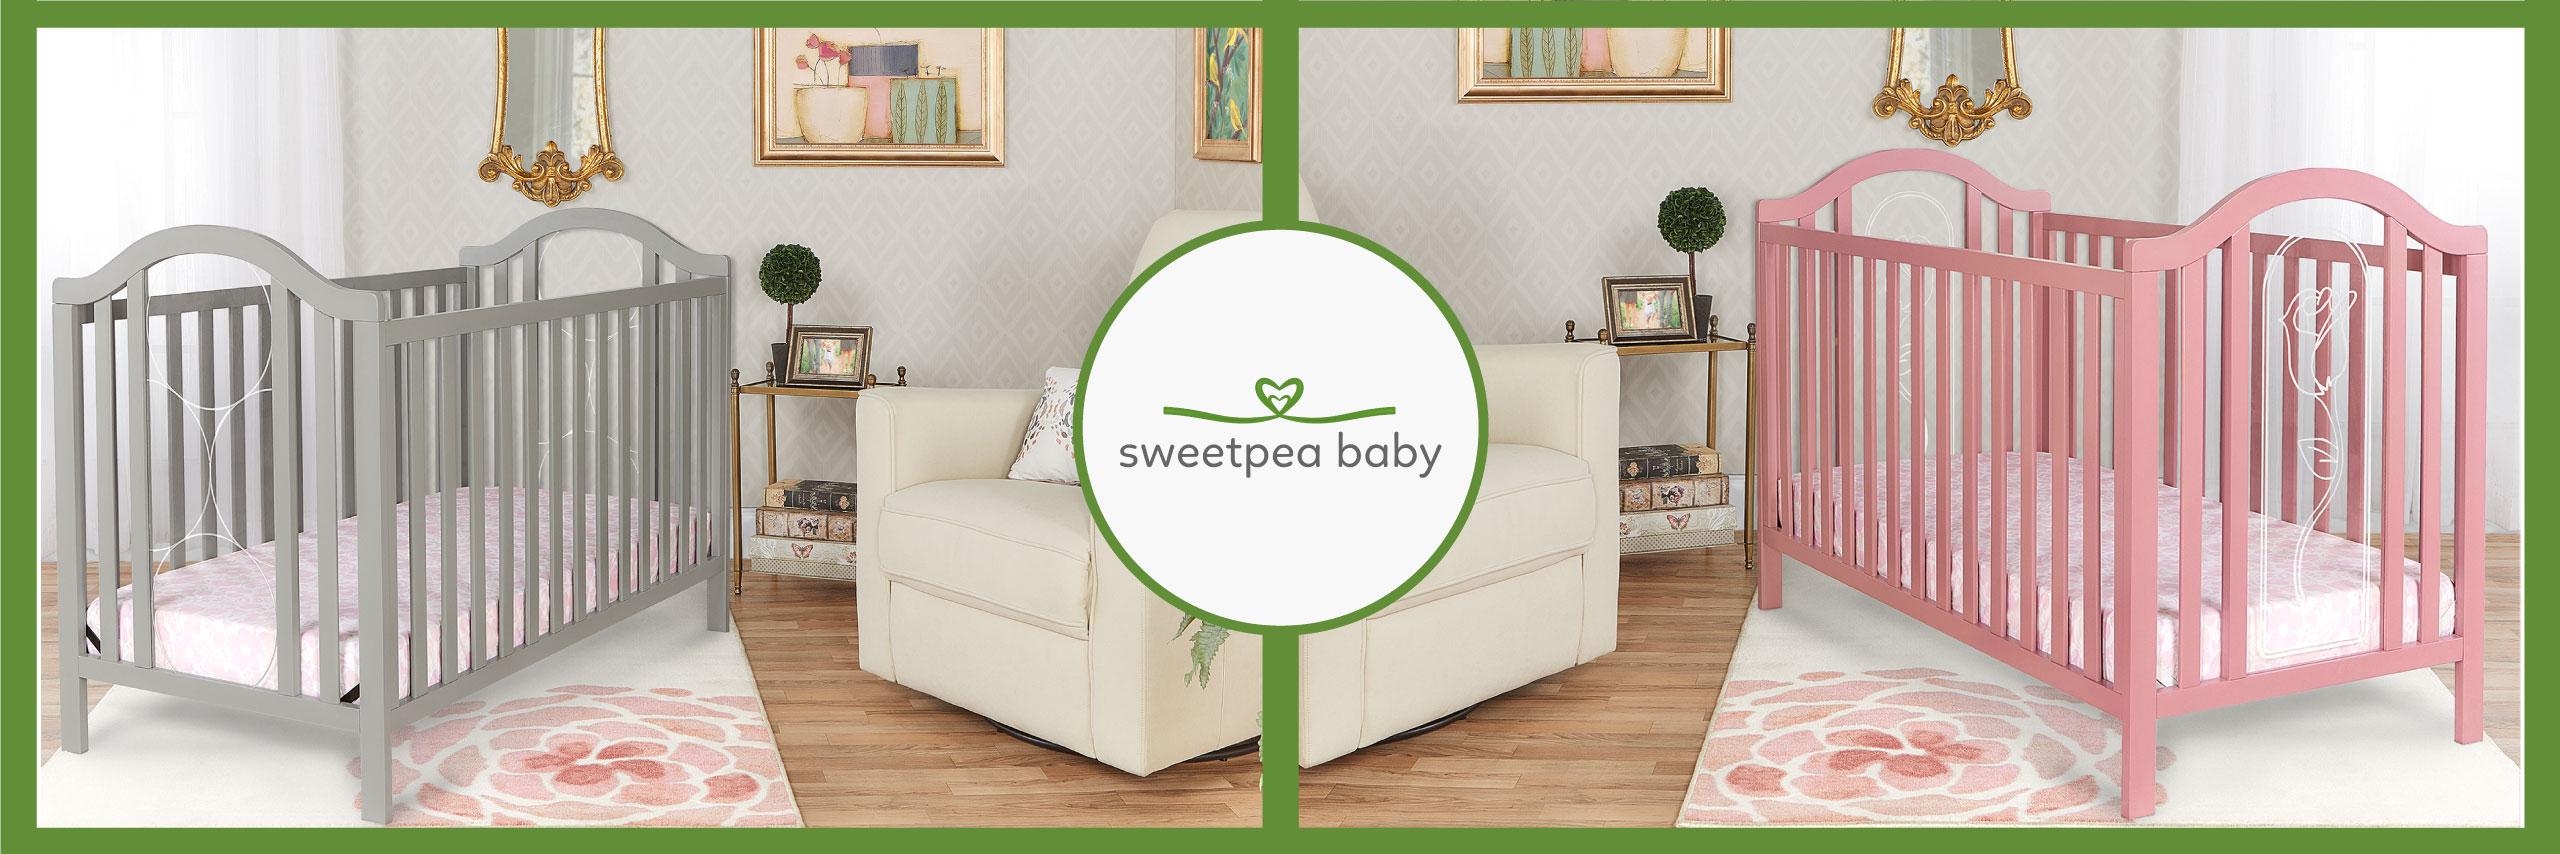 Sweetpea-Banner